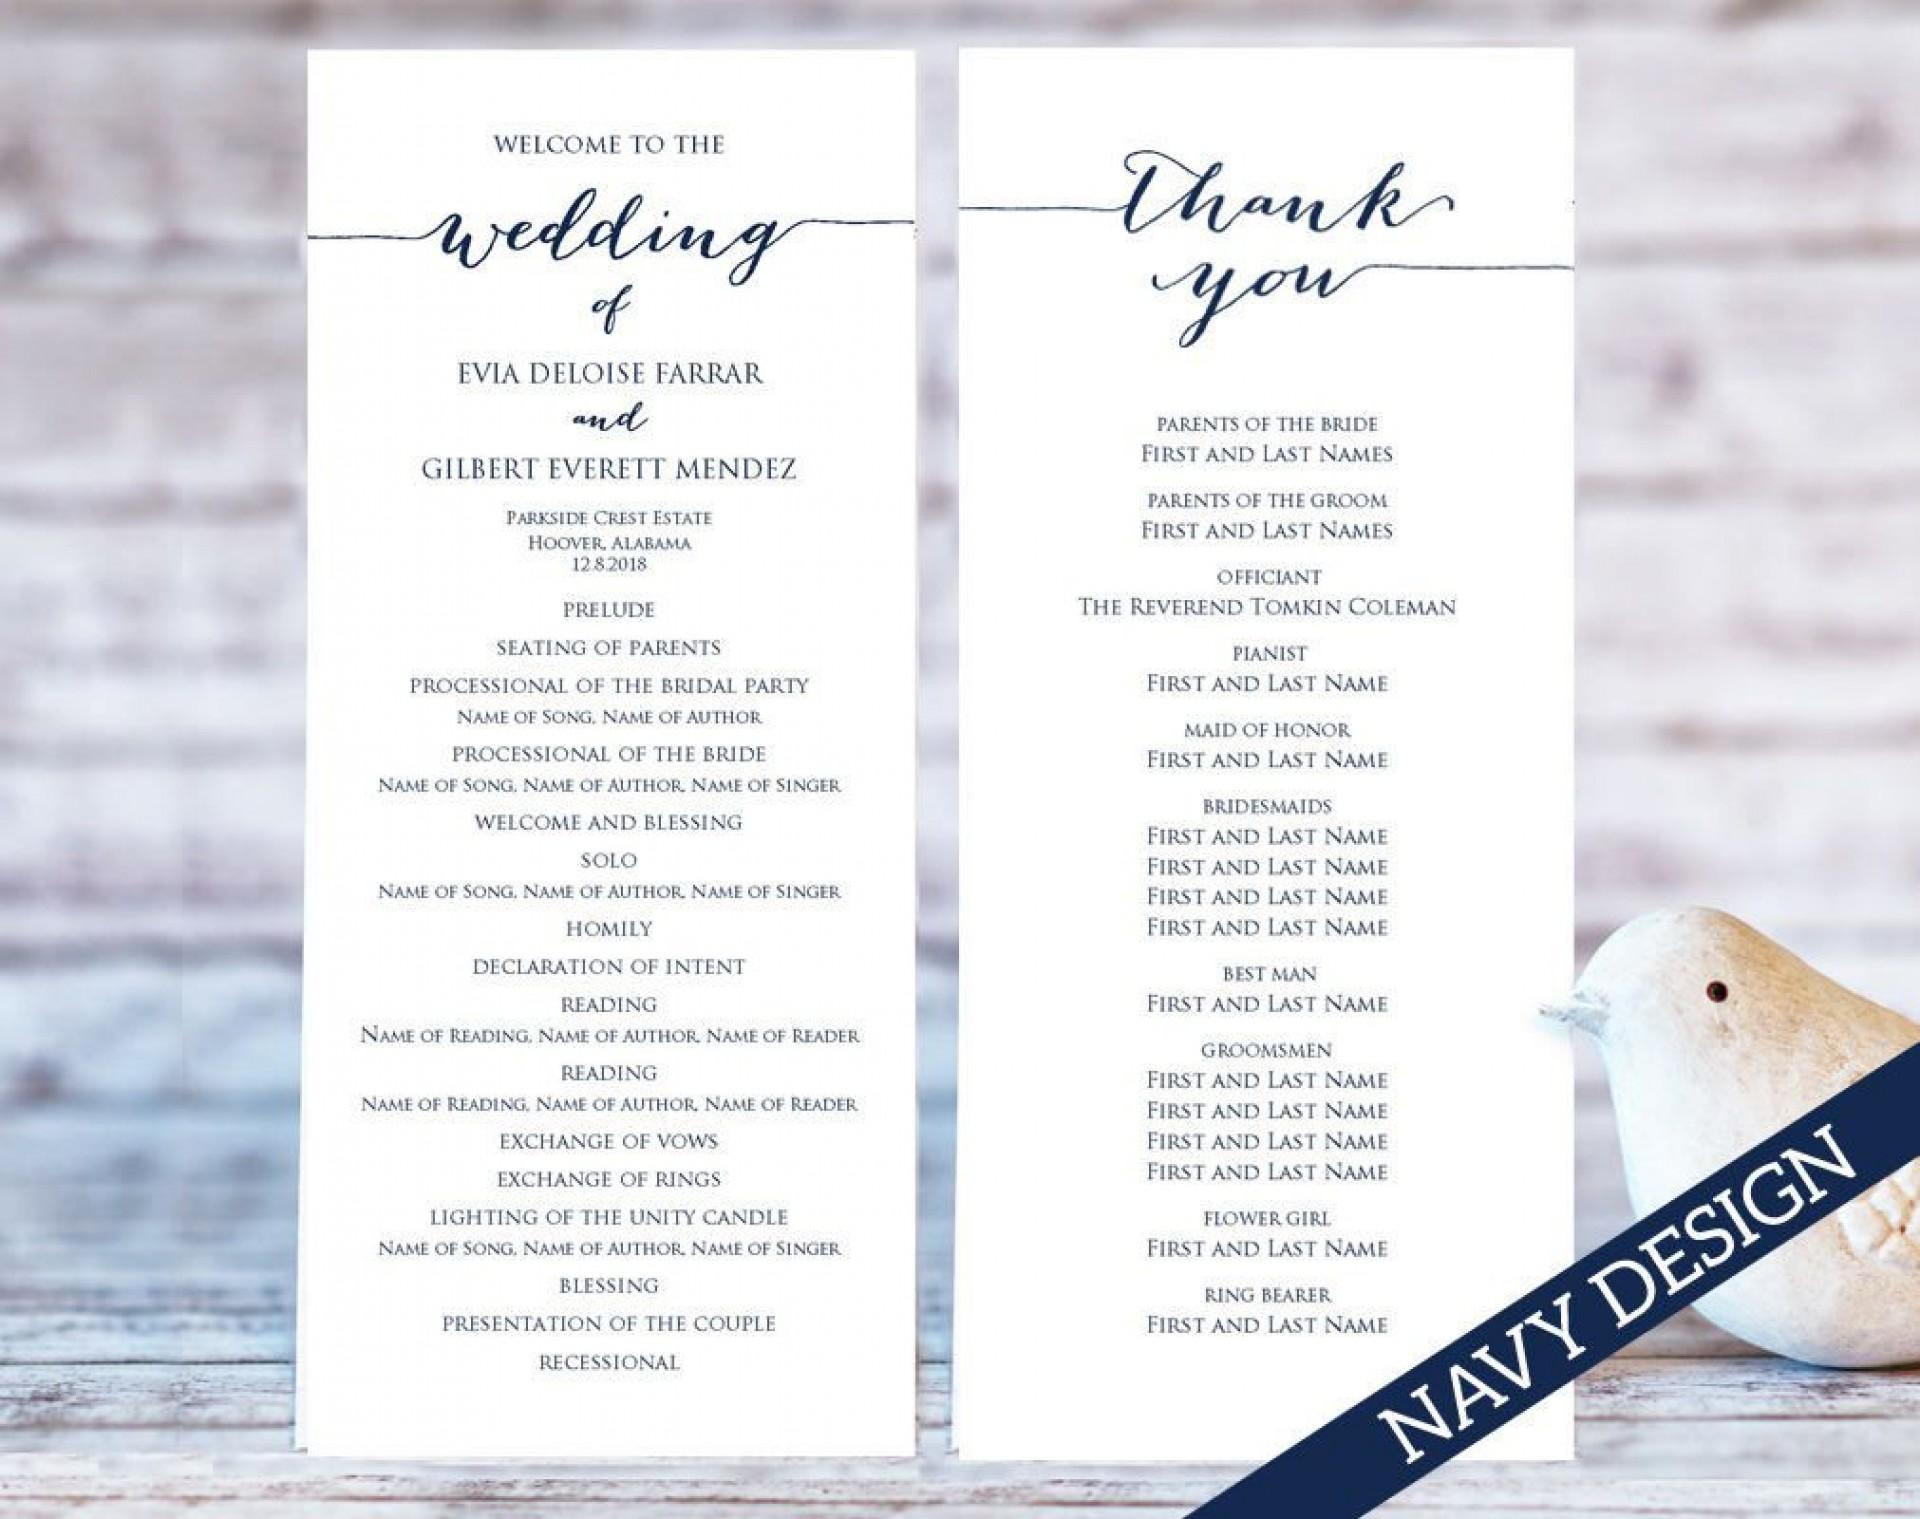 009 Frightening Free Printable Wedding Program Template High Def  Templates Microsoft Word Indian1920